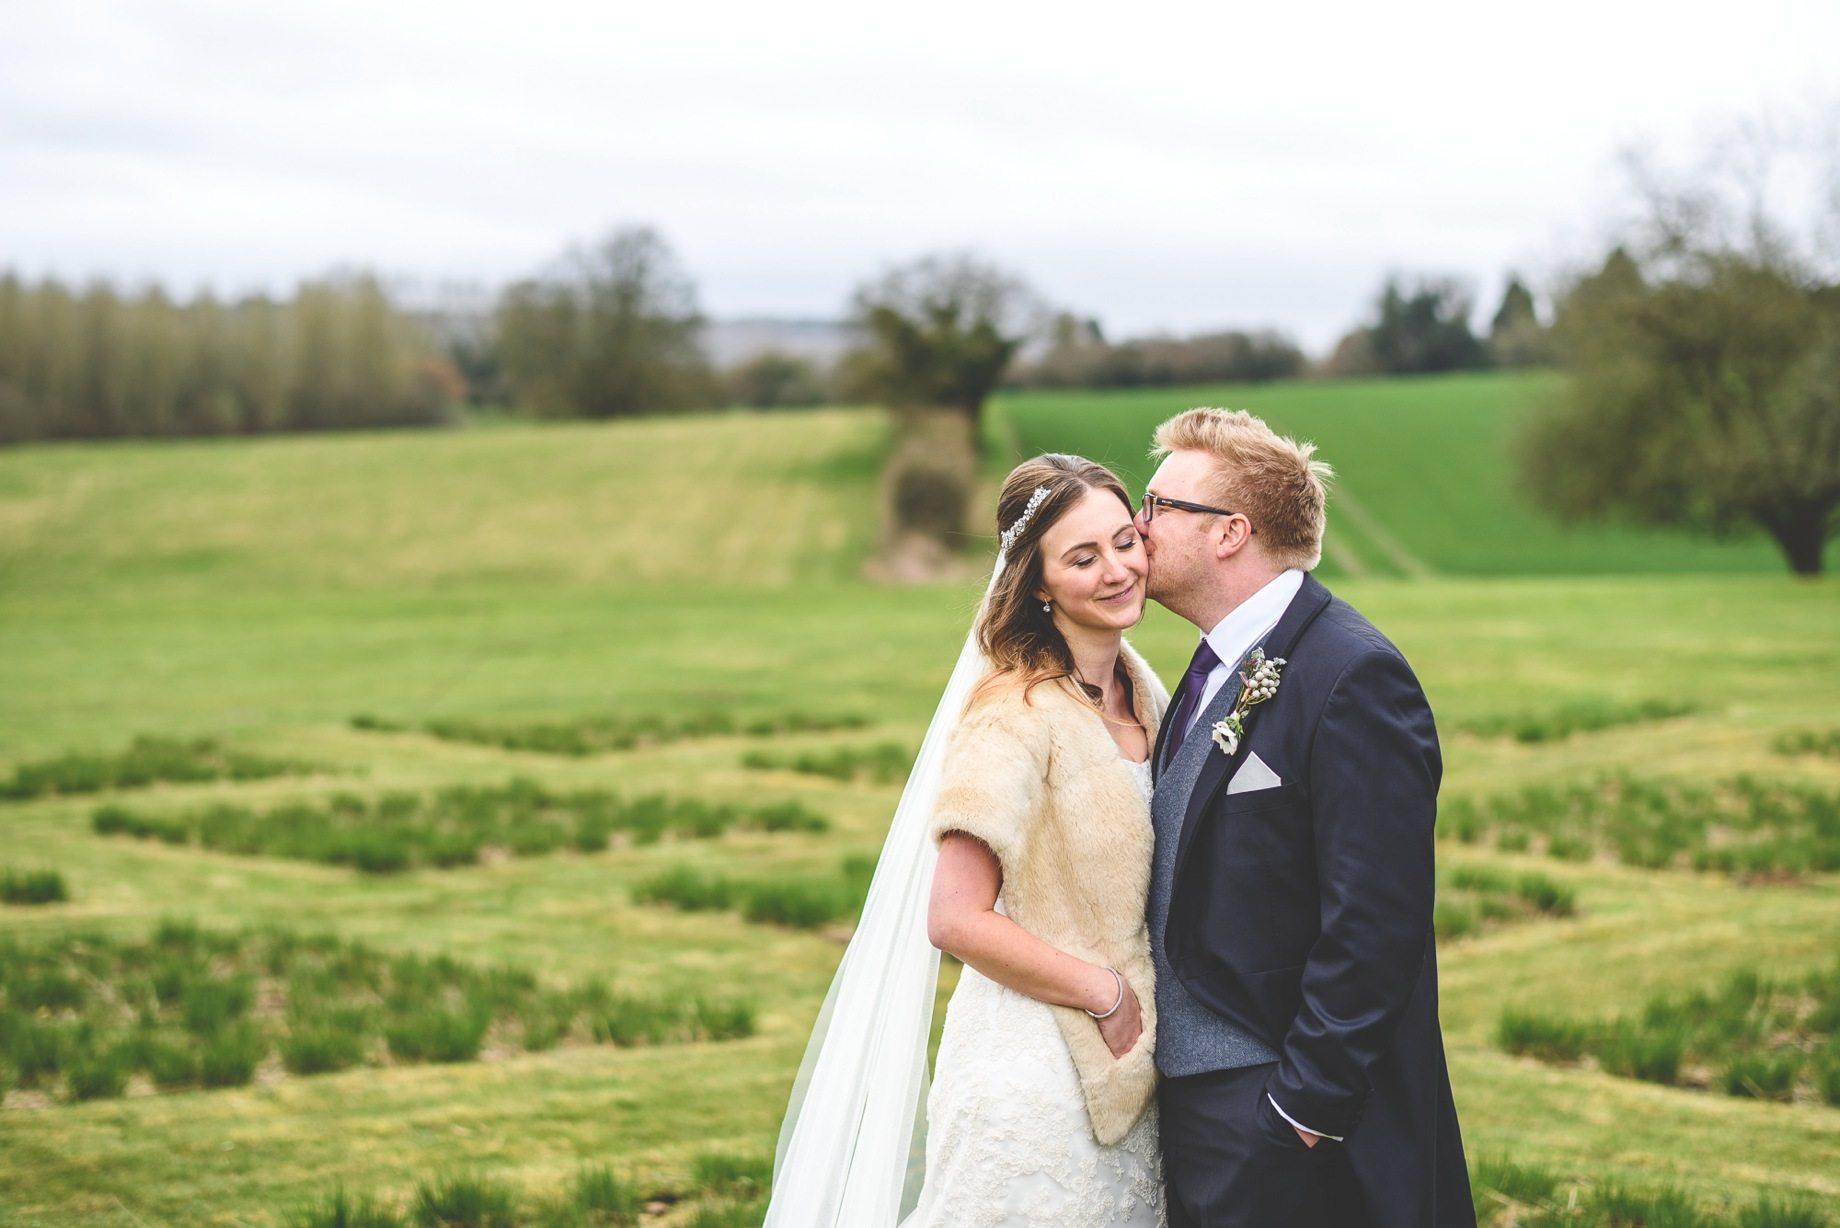 Heather-and-Chris-Hampshire-wedding-photography-124-of-174